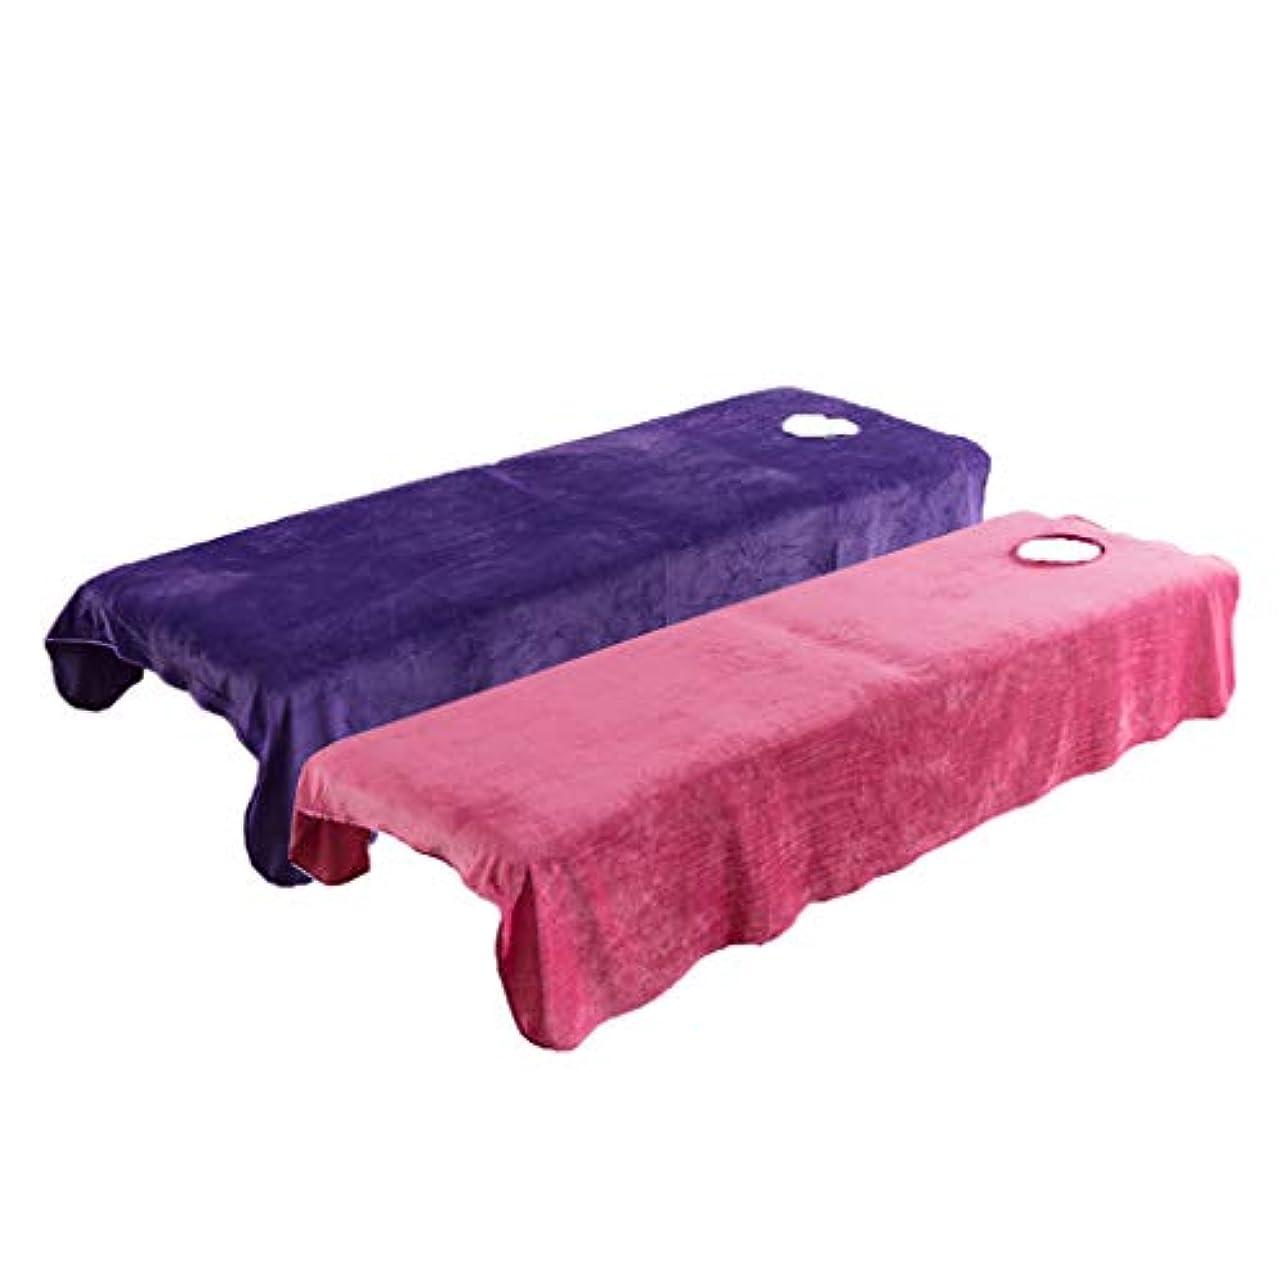 KESOTO 2点セット マッサージベッドカバー 有孔 スパ 美容ベッドカバー クリスタルベルベット素材 120x190cm